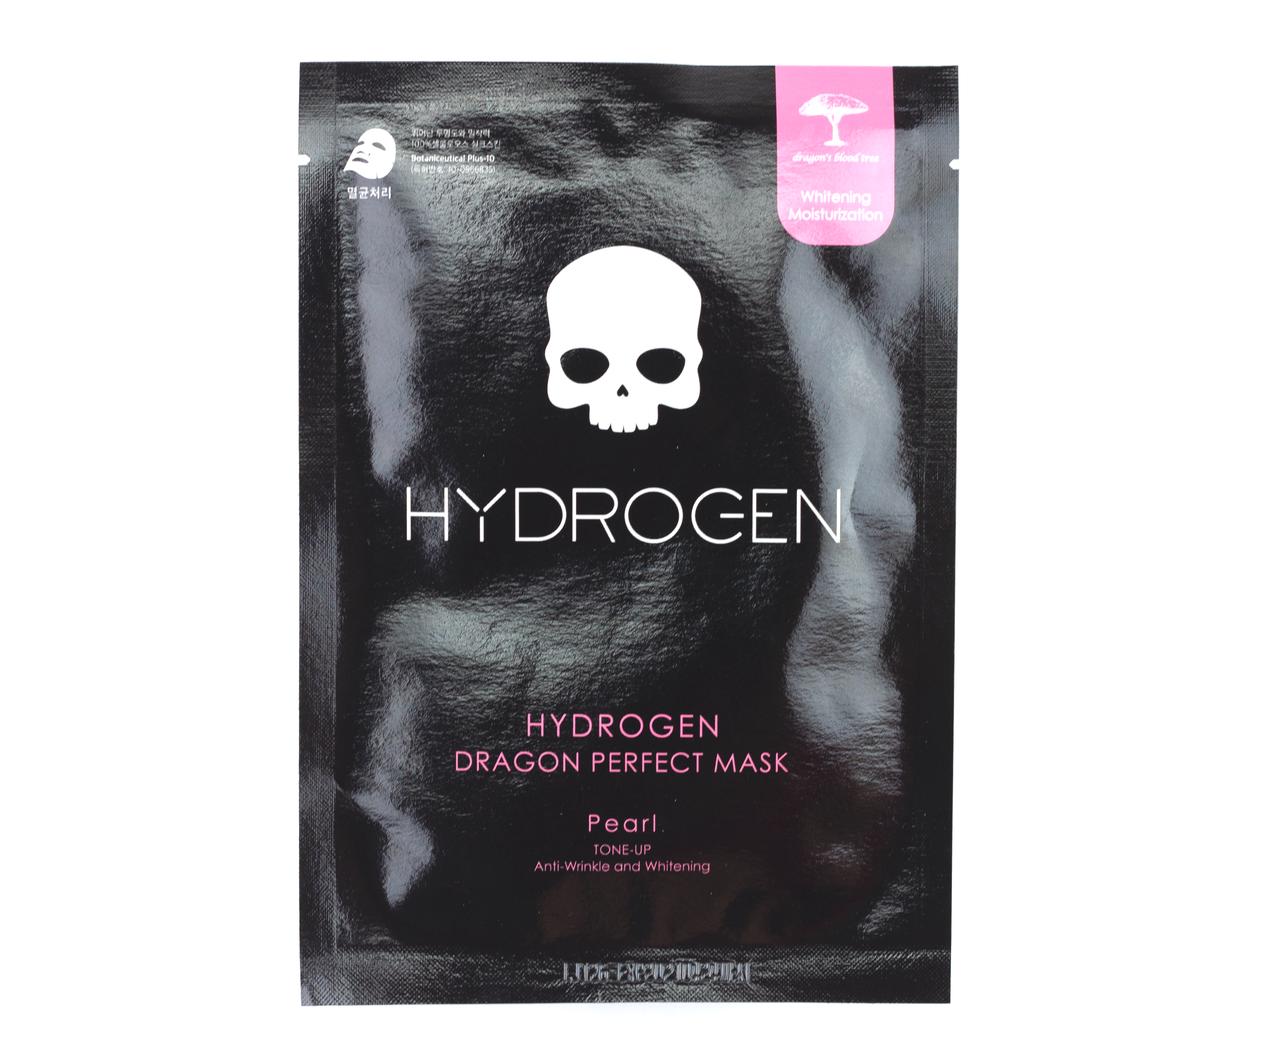 Осветляющая тканевая маска с жемчугом HYDROGEN DRAGON PERFECT MASK PEARL - 1 шт.